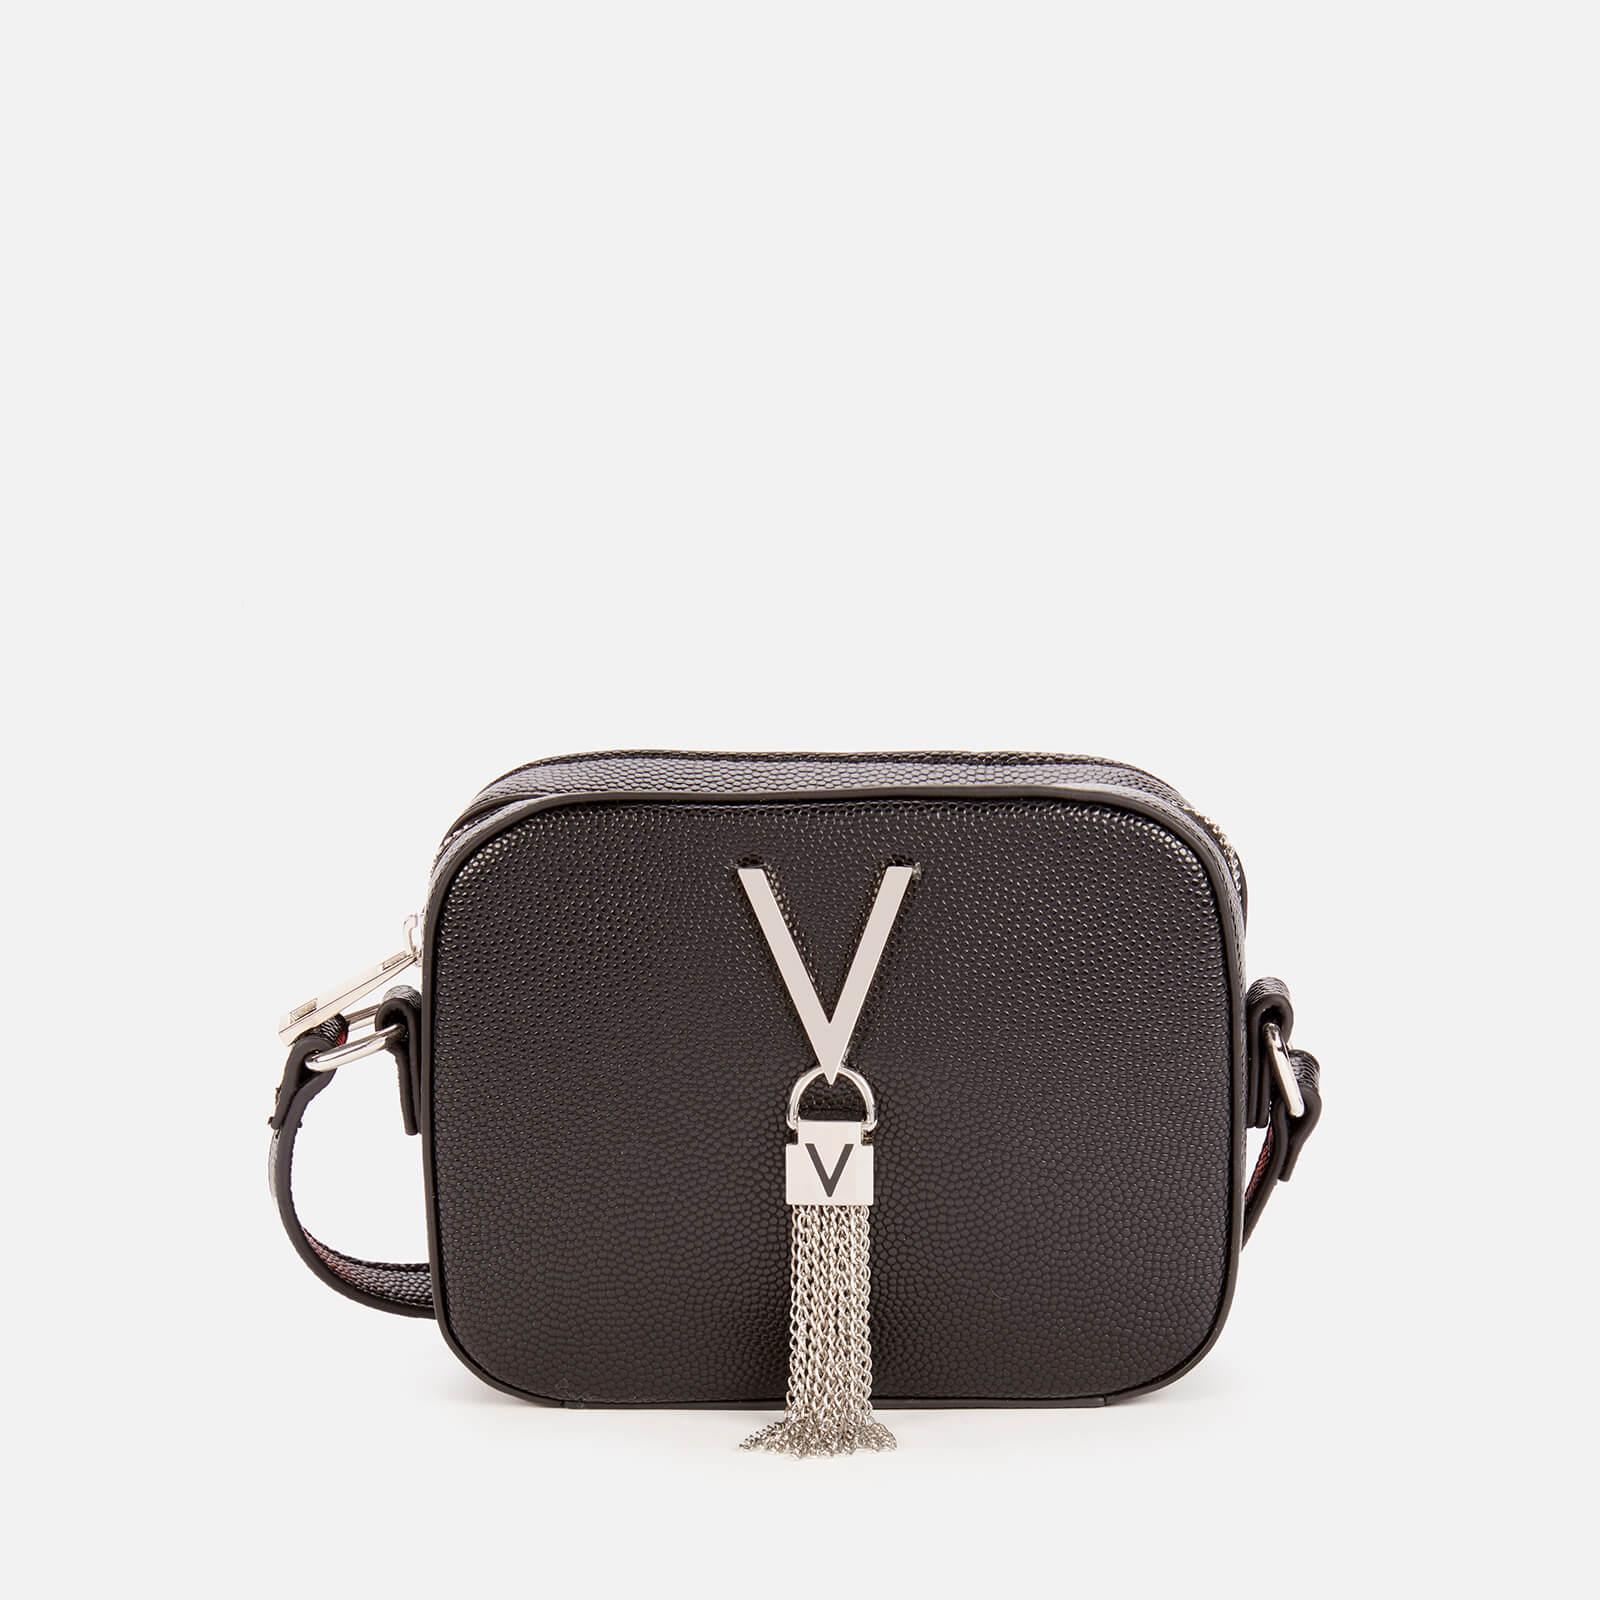 Valentino Bags Women's Divina Camera Bag - Black